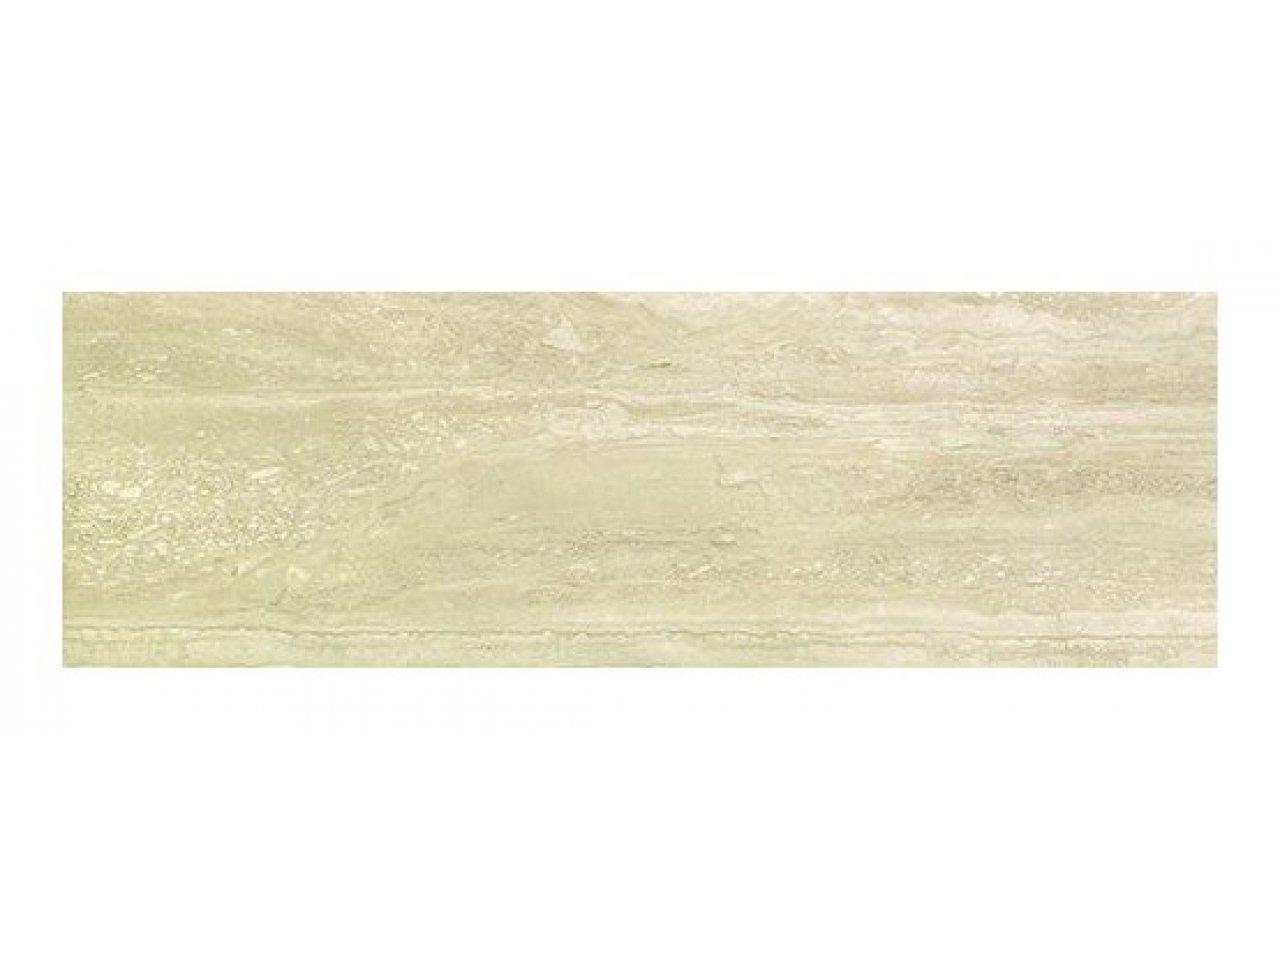 Настенная плитка FAP Roma Travertino 75 x 25 см, Арт. fLSS